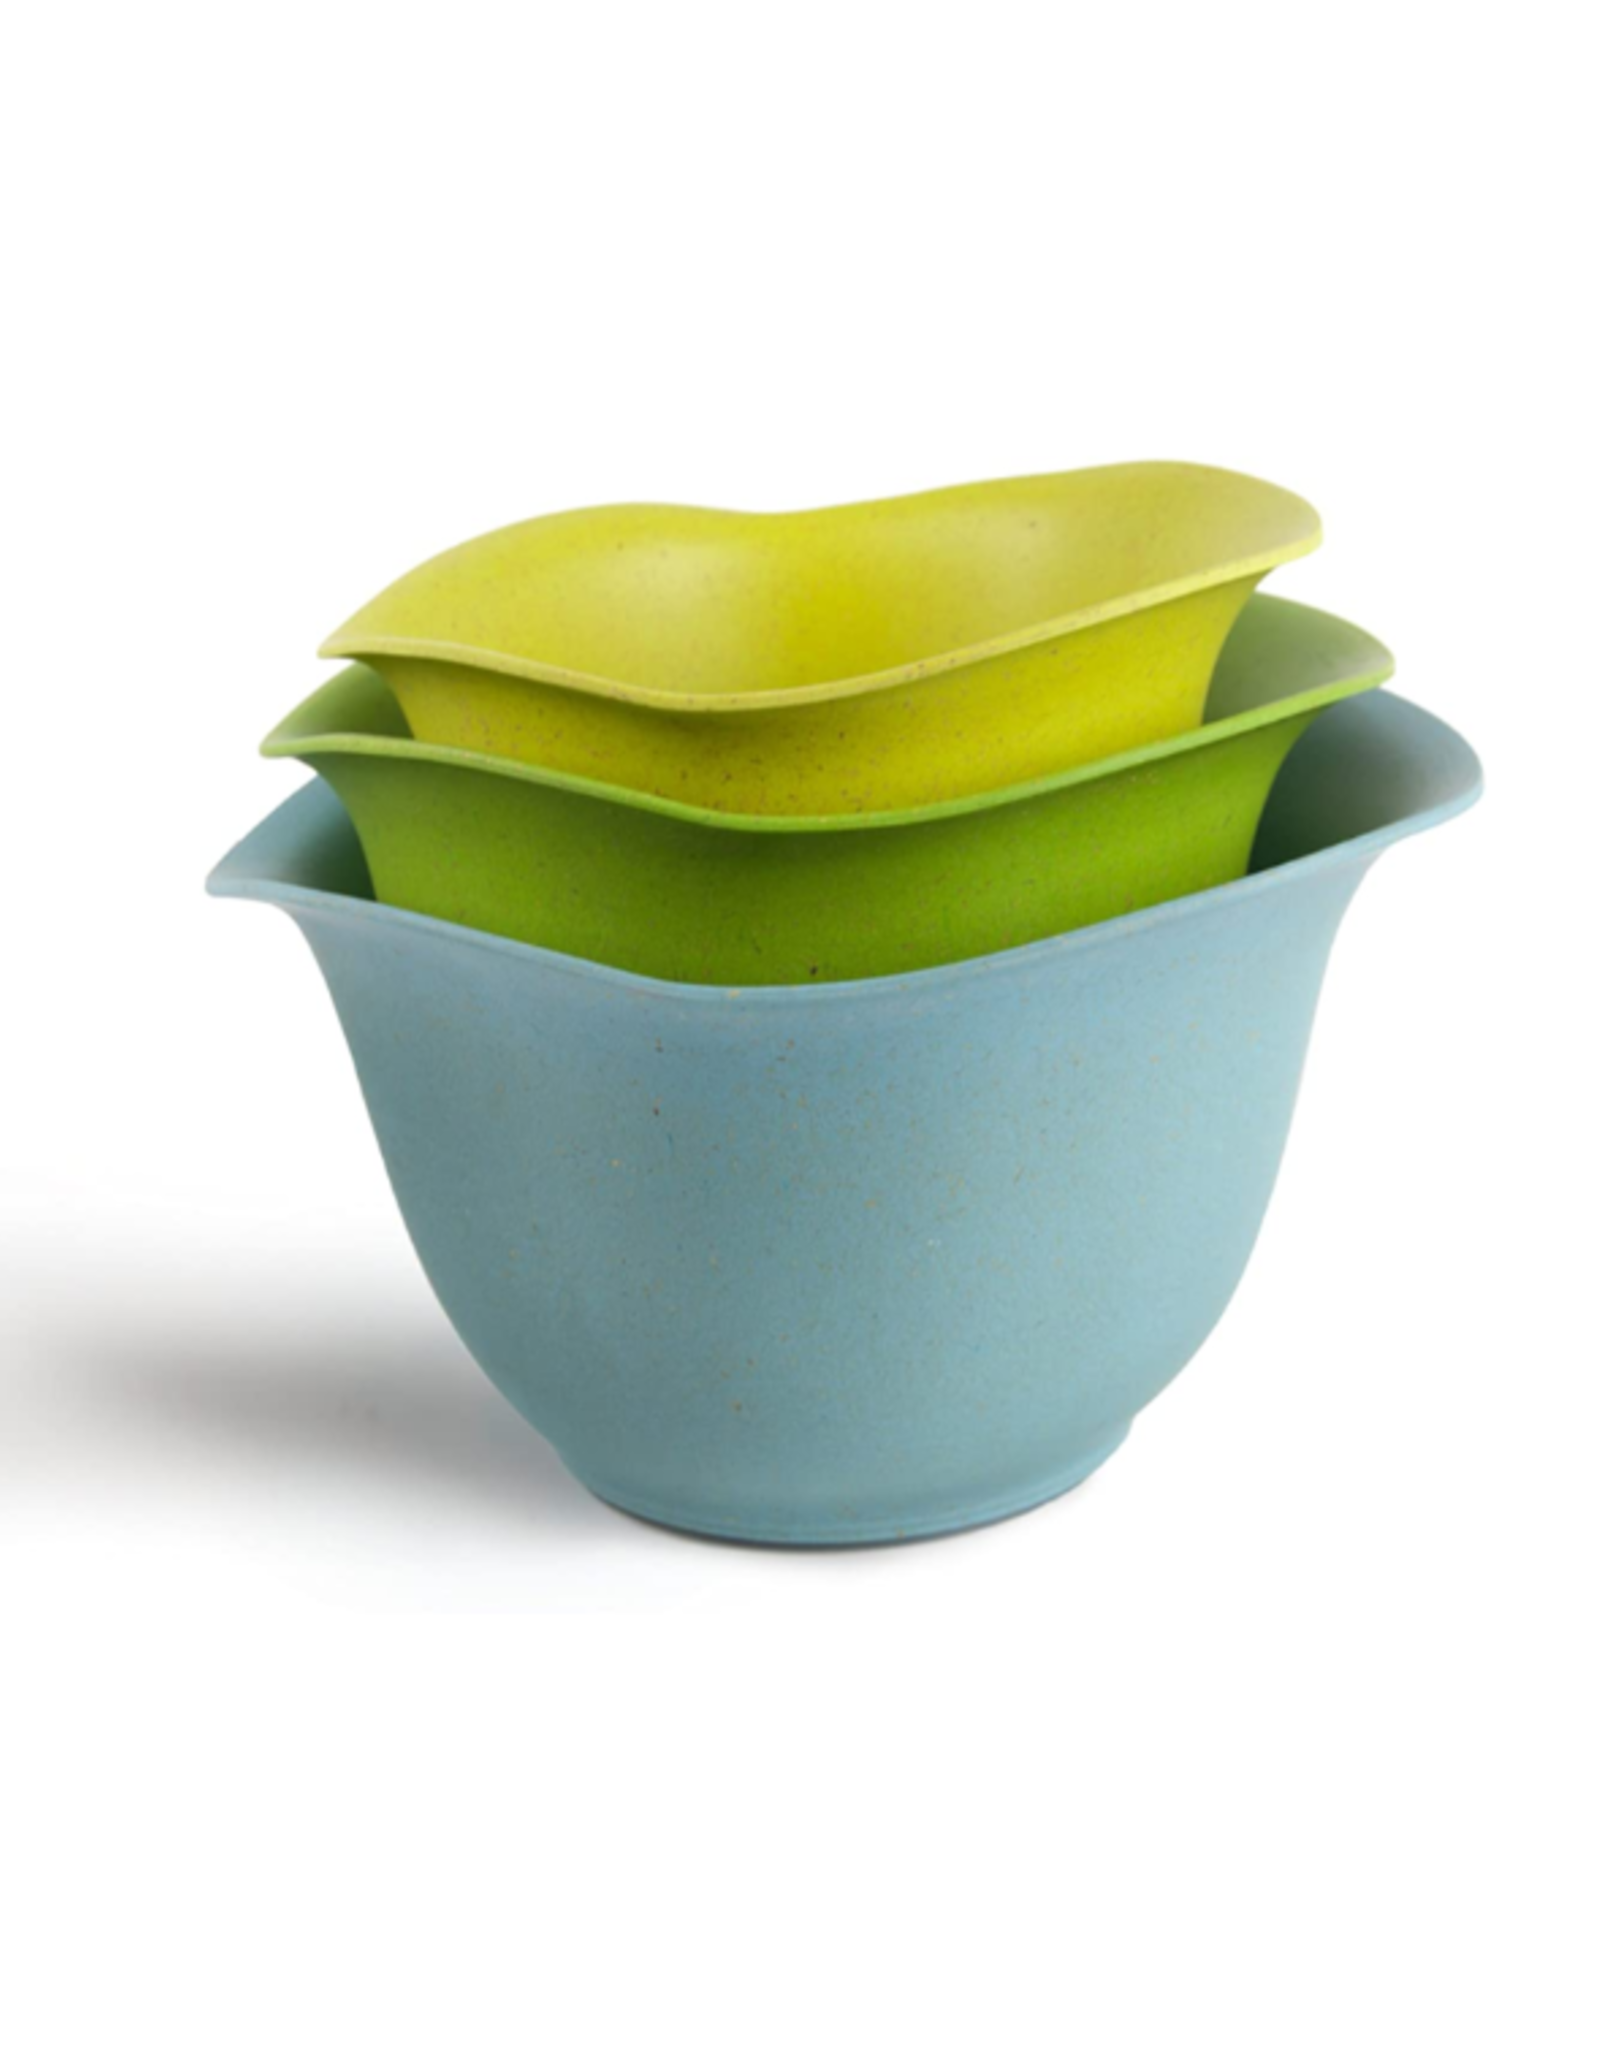 Architec Purelast Mixing Bowl Set, green to blue